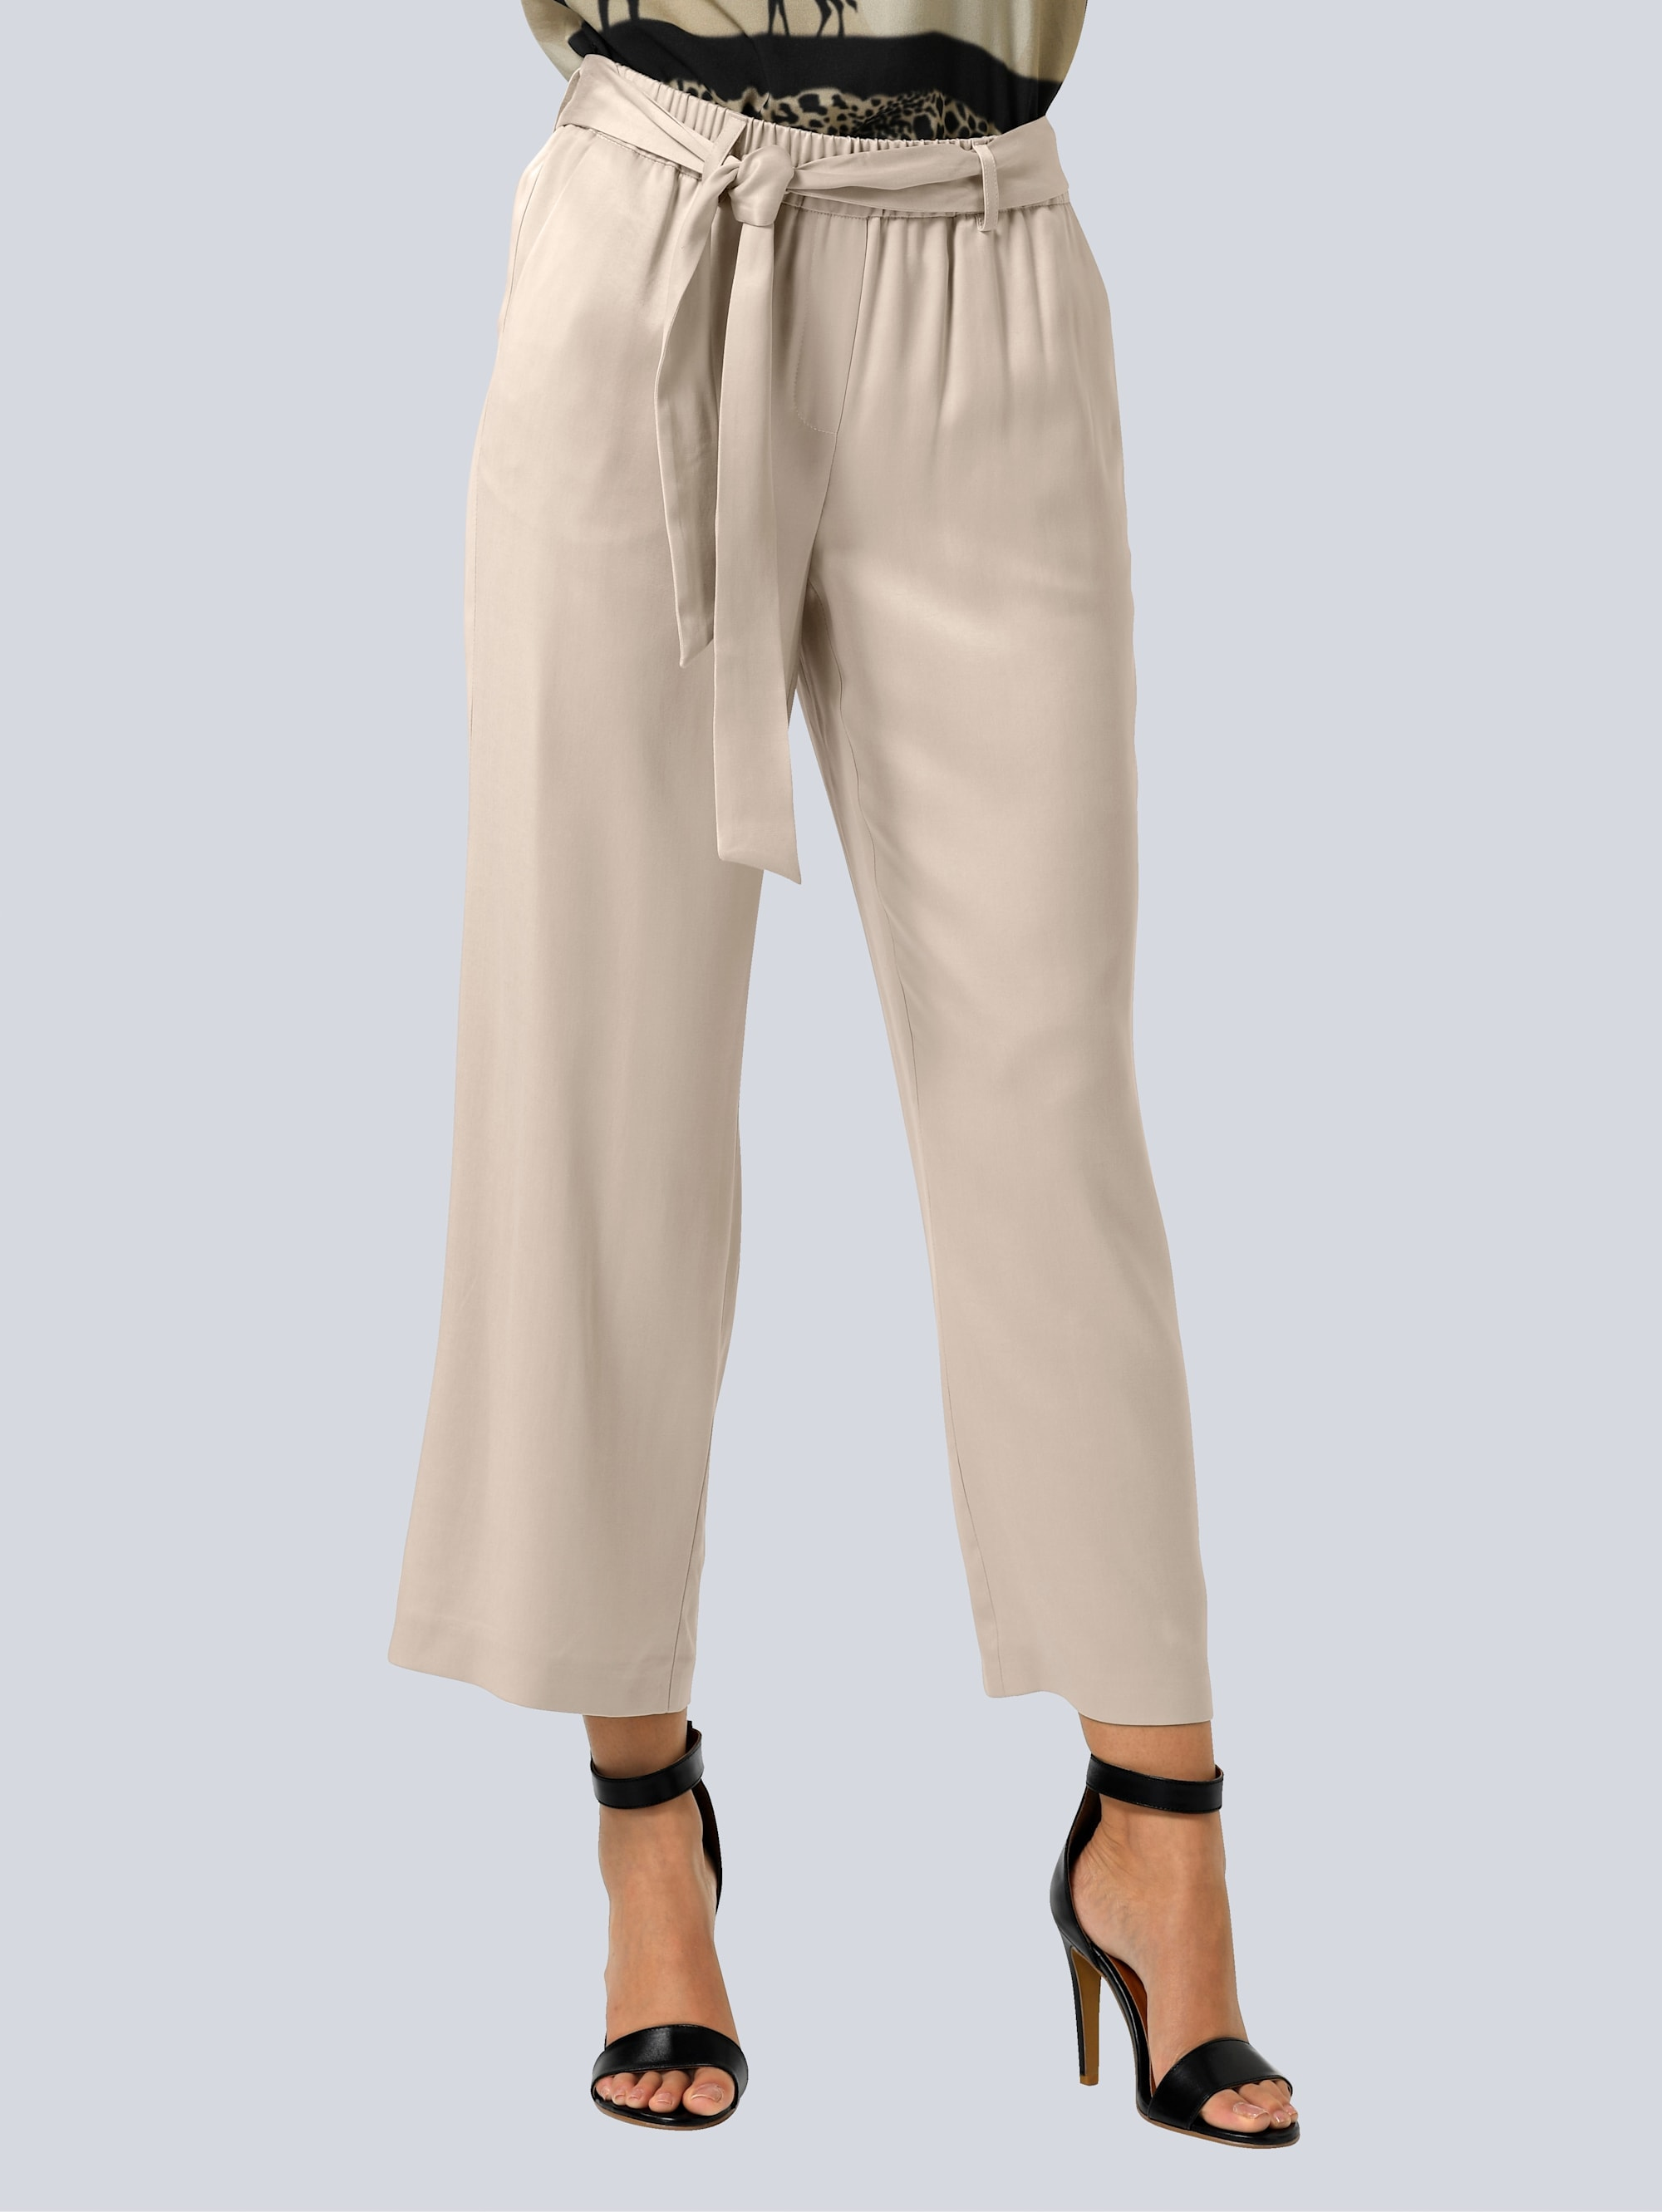 alba moda -  Culotte, aus edler Ware